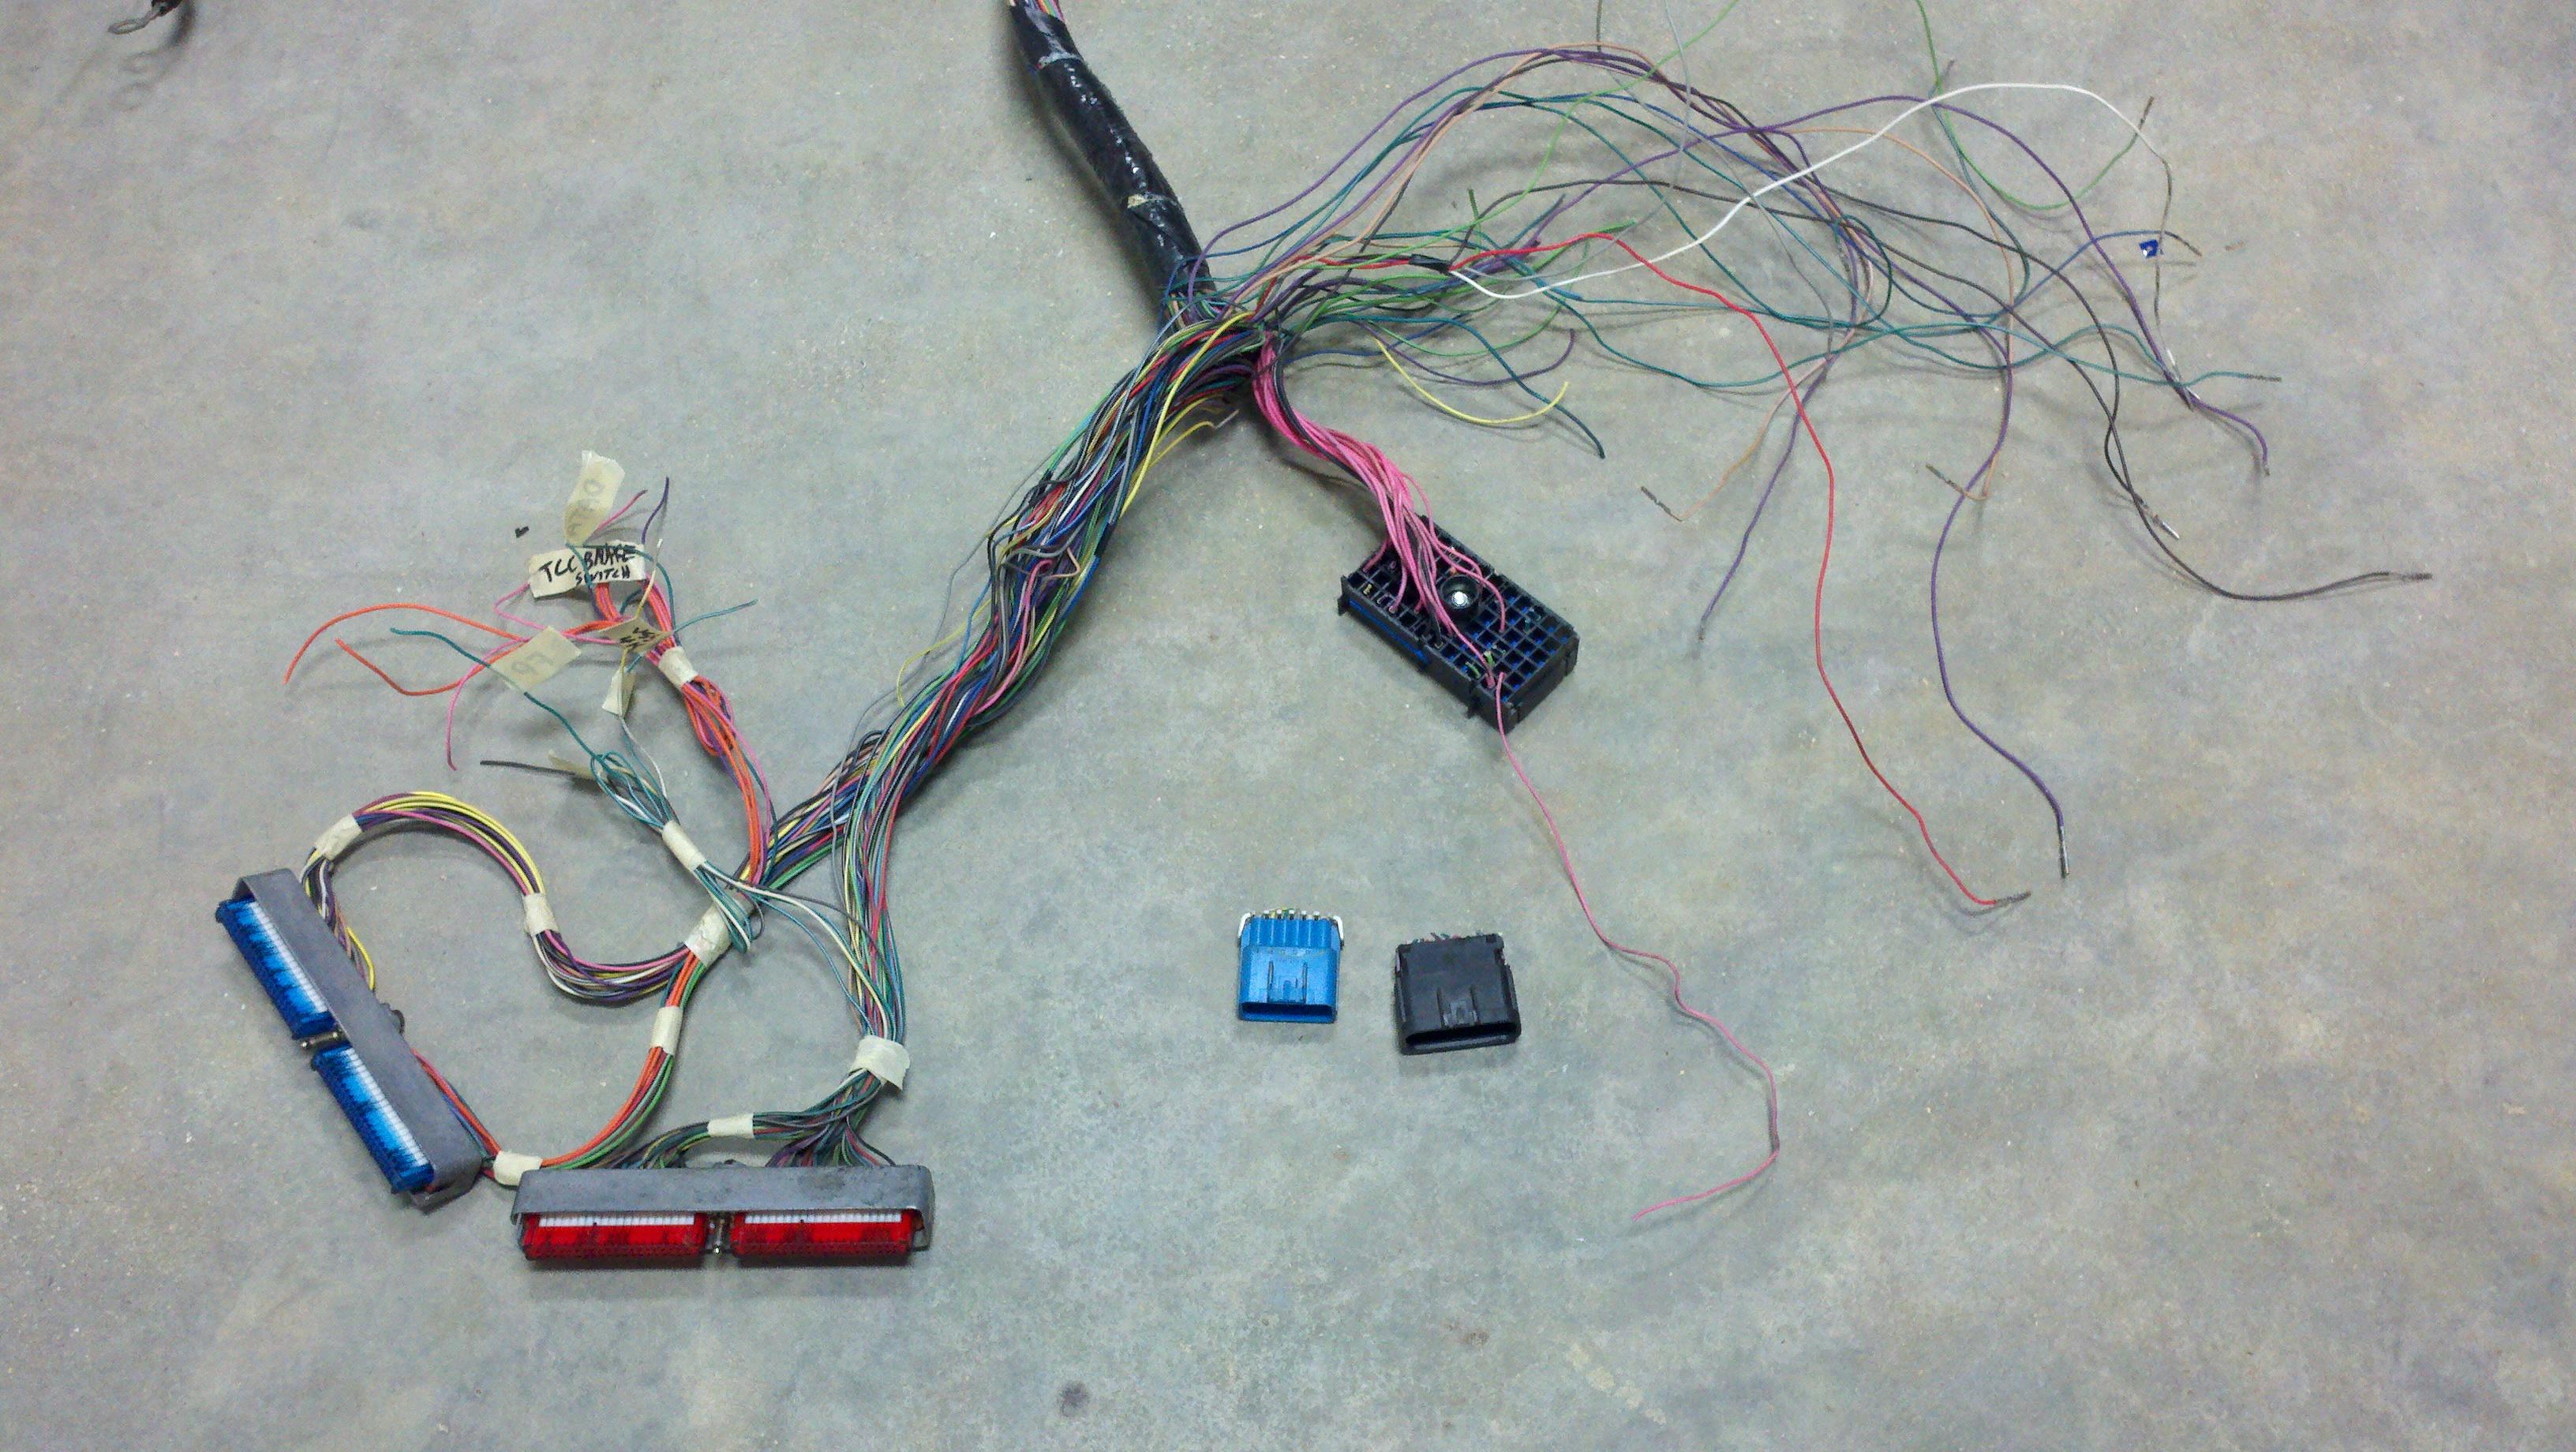 chevy vortec ecm wiring diagram get free image about wiring diagram